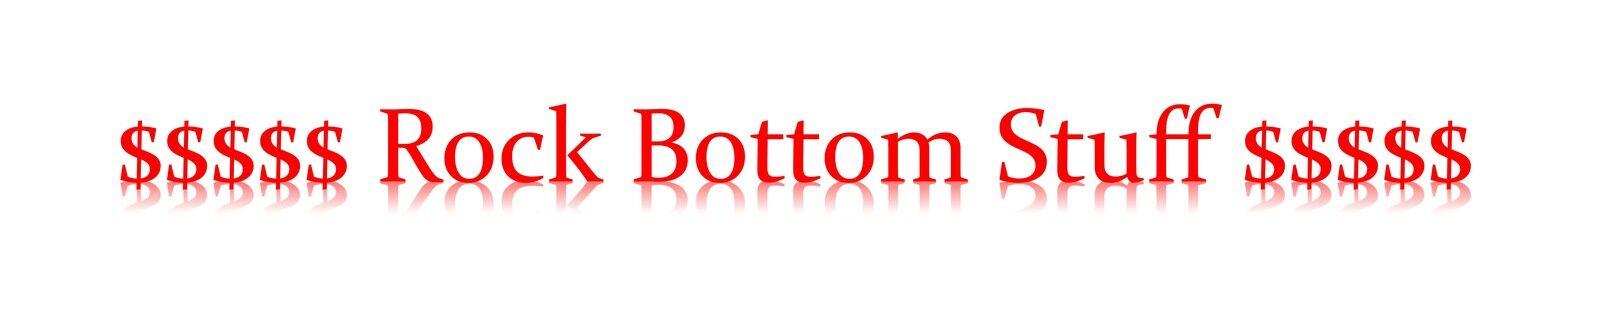 Rock Bottom Stuff